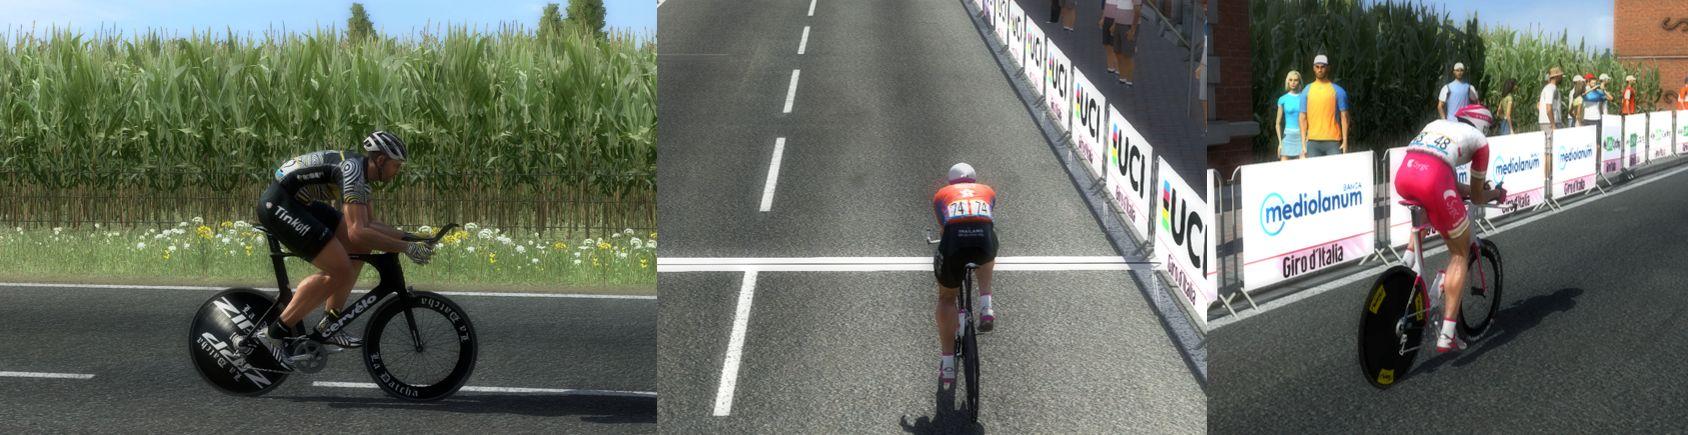 pcmdaily.com/images/mg/2020/Reports/GTM/Giro/S14/mg20_giro_s14_07.jpg